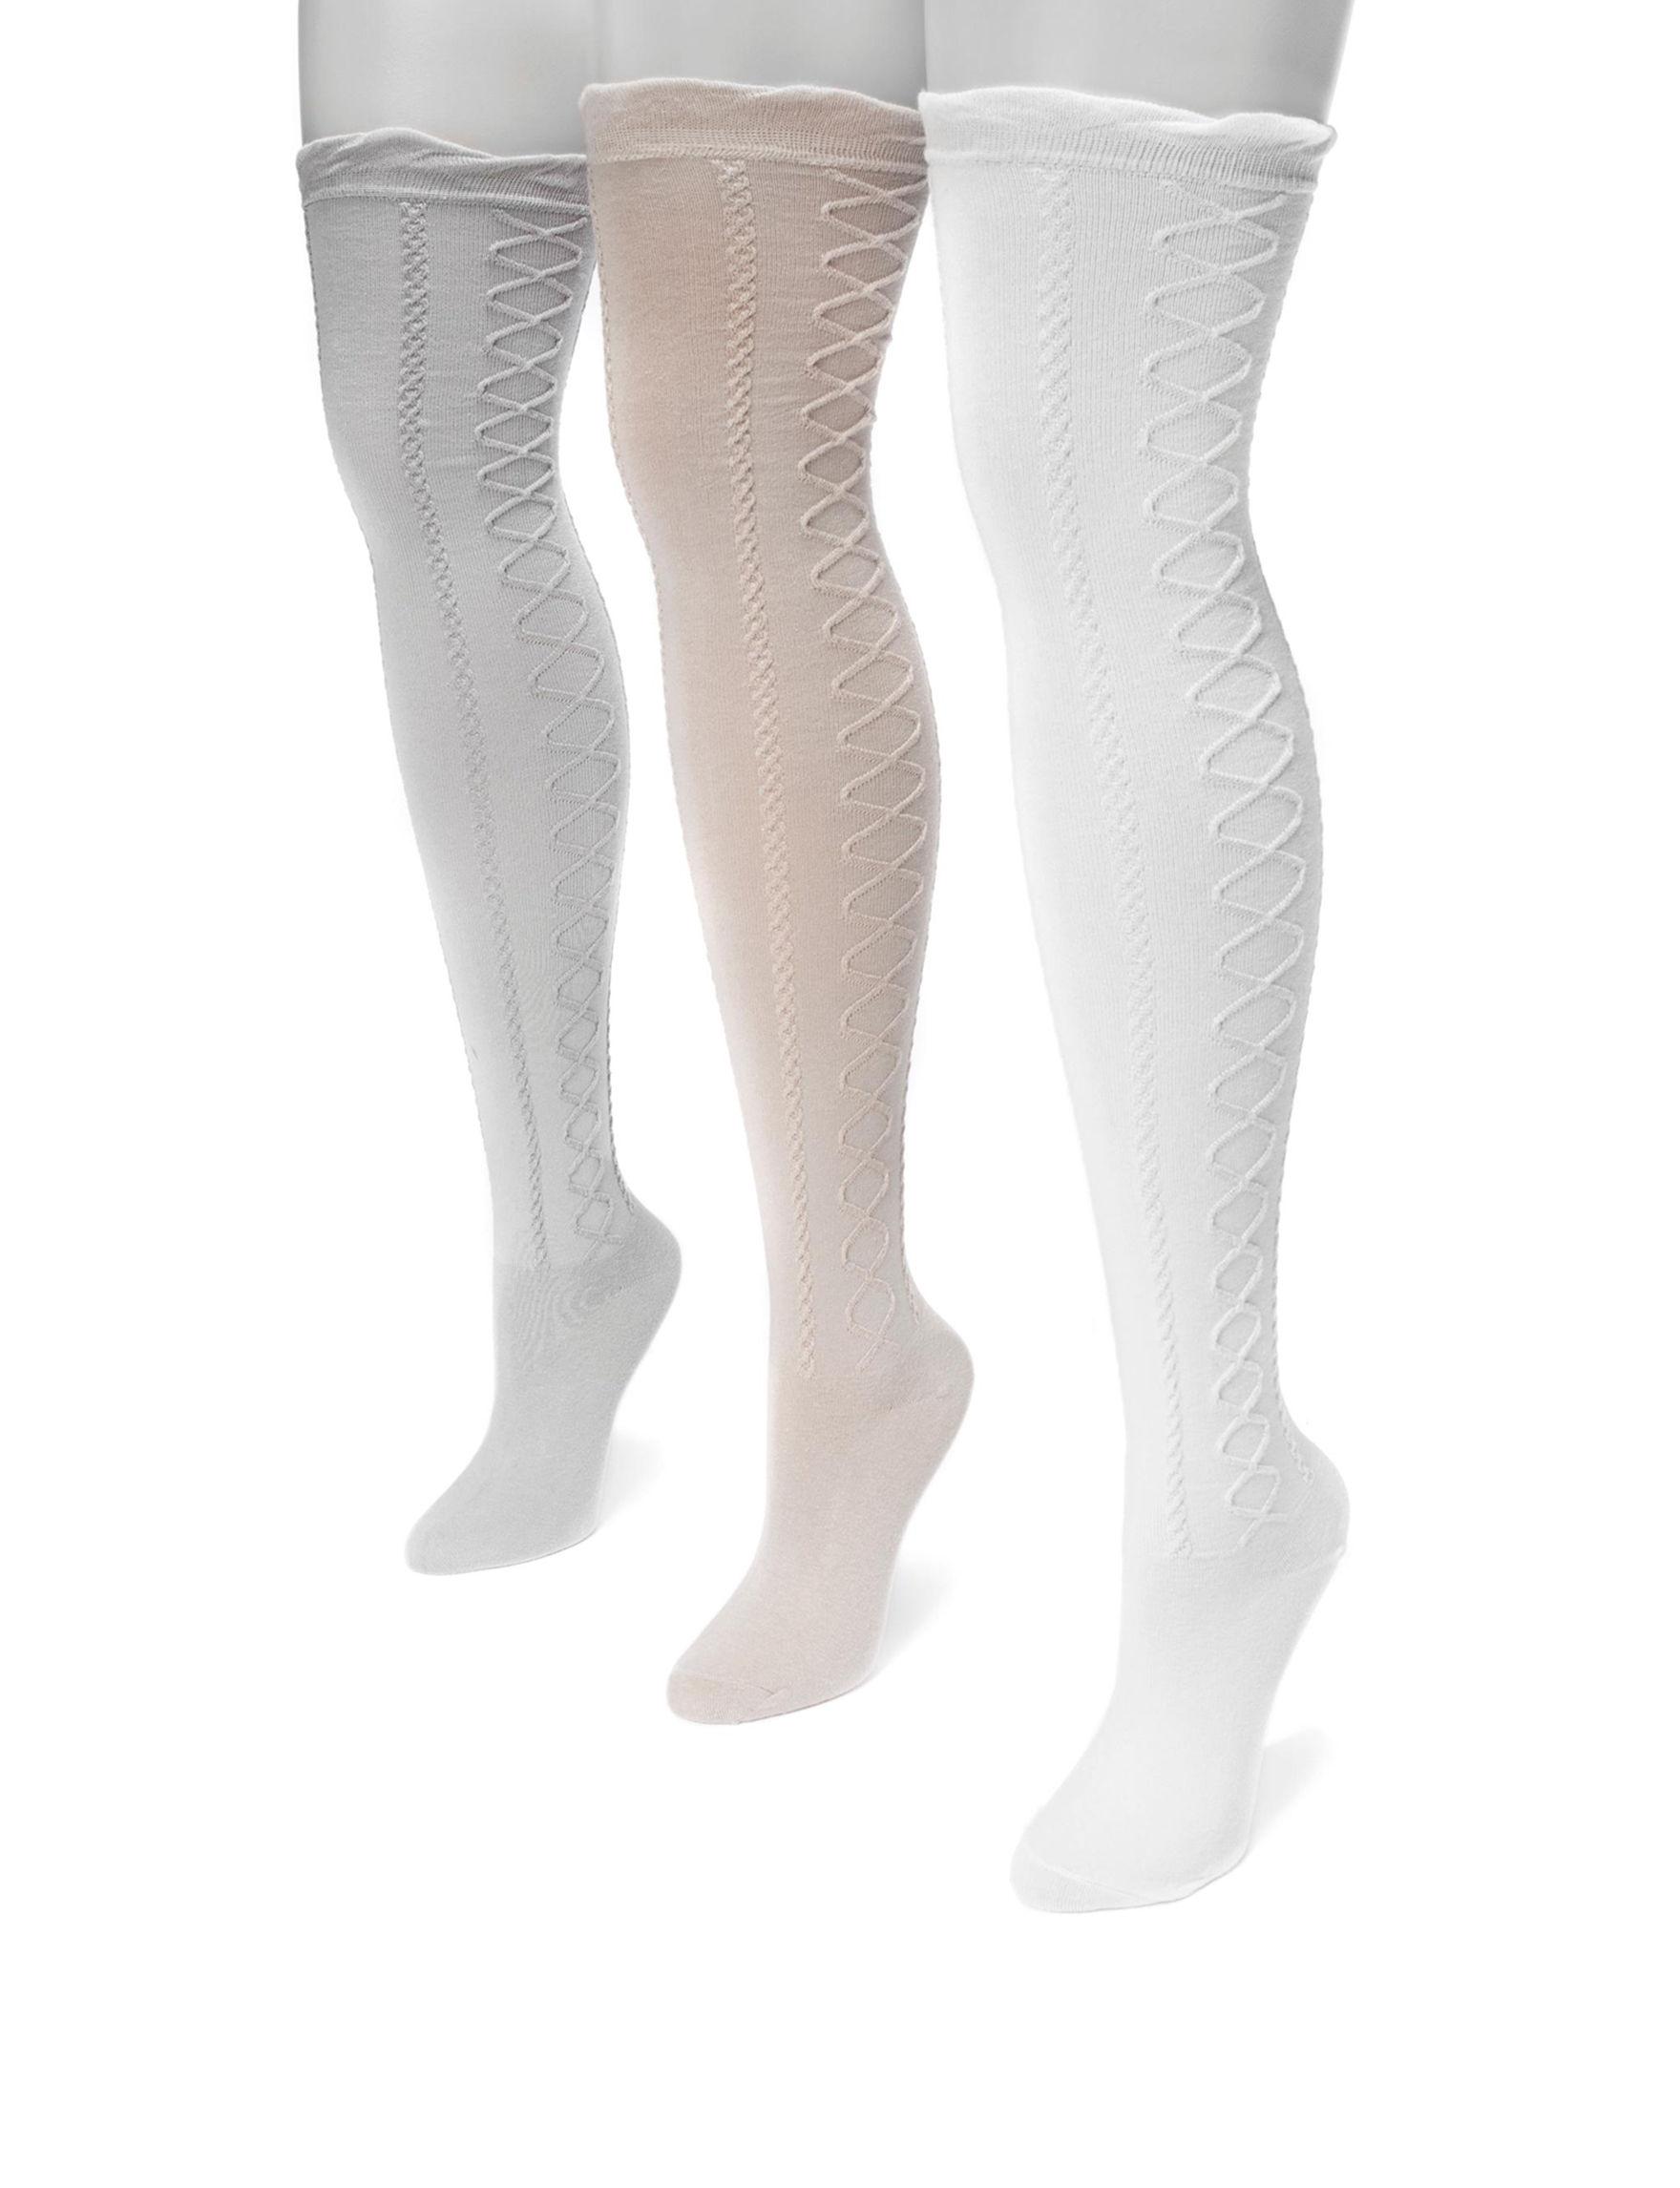 Muk Luks Grey Multi Socks